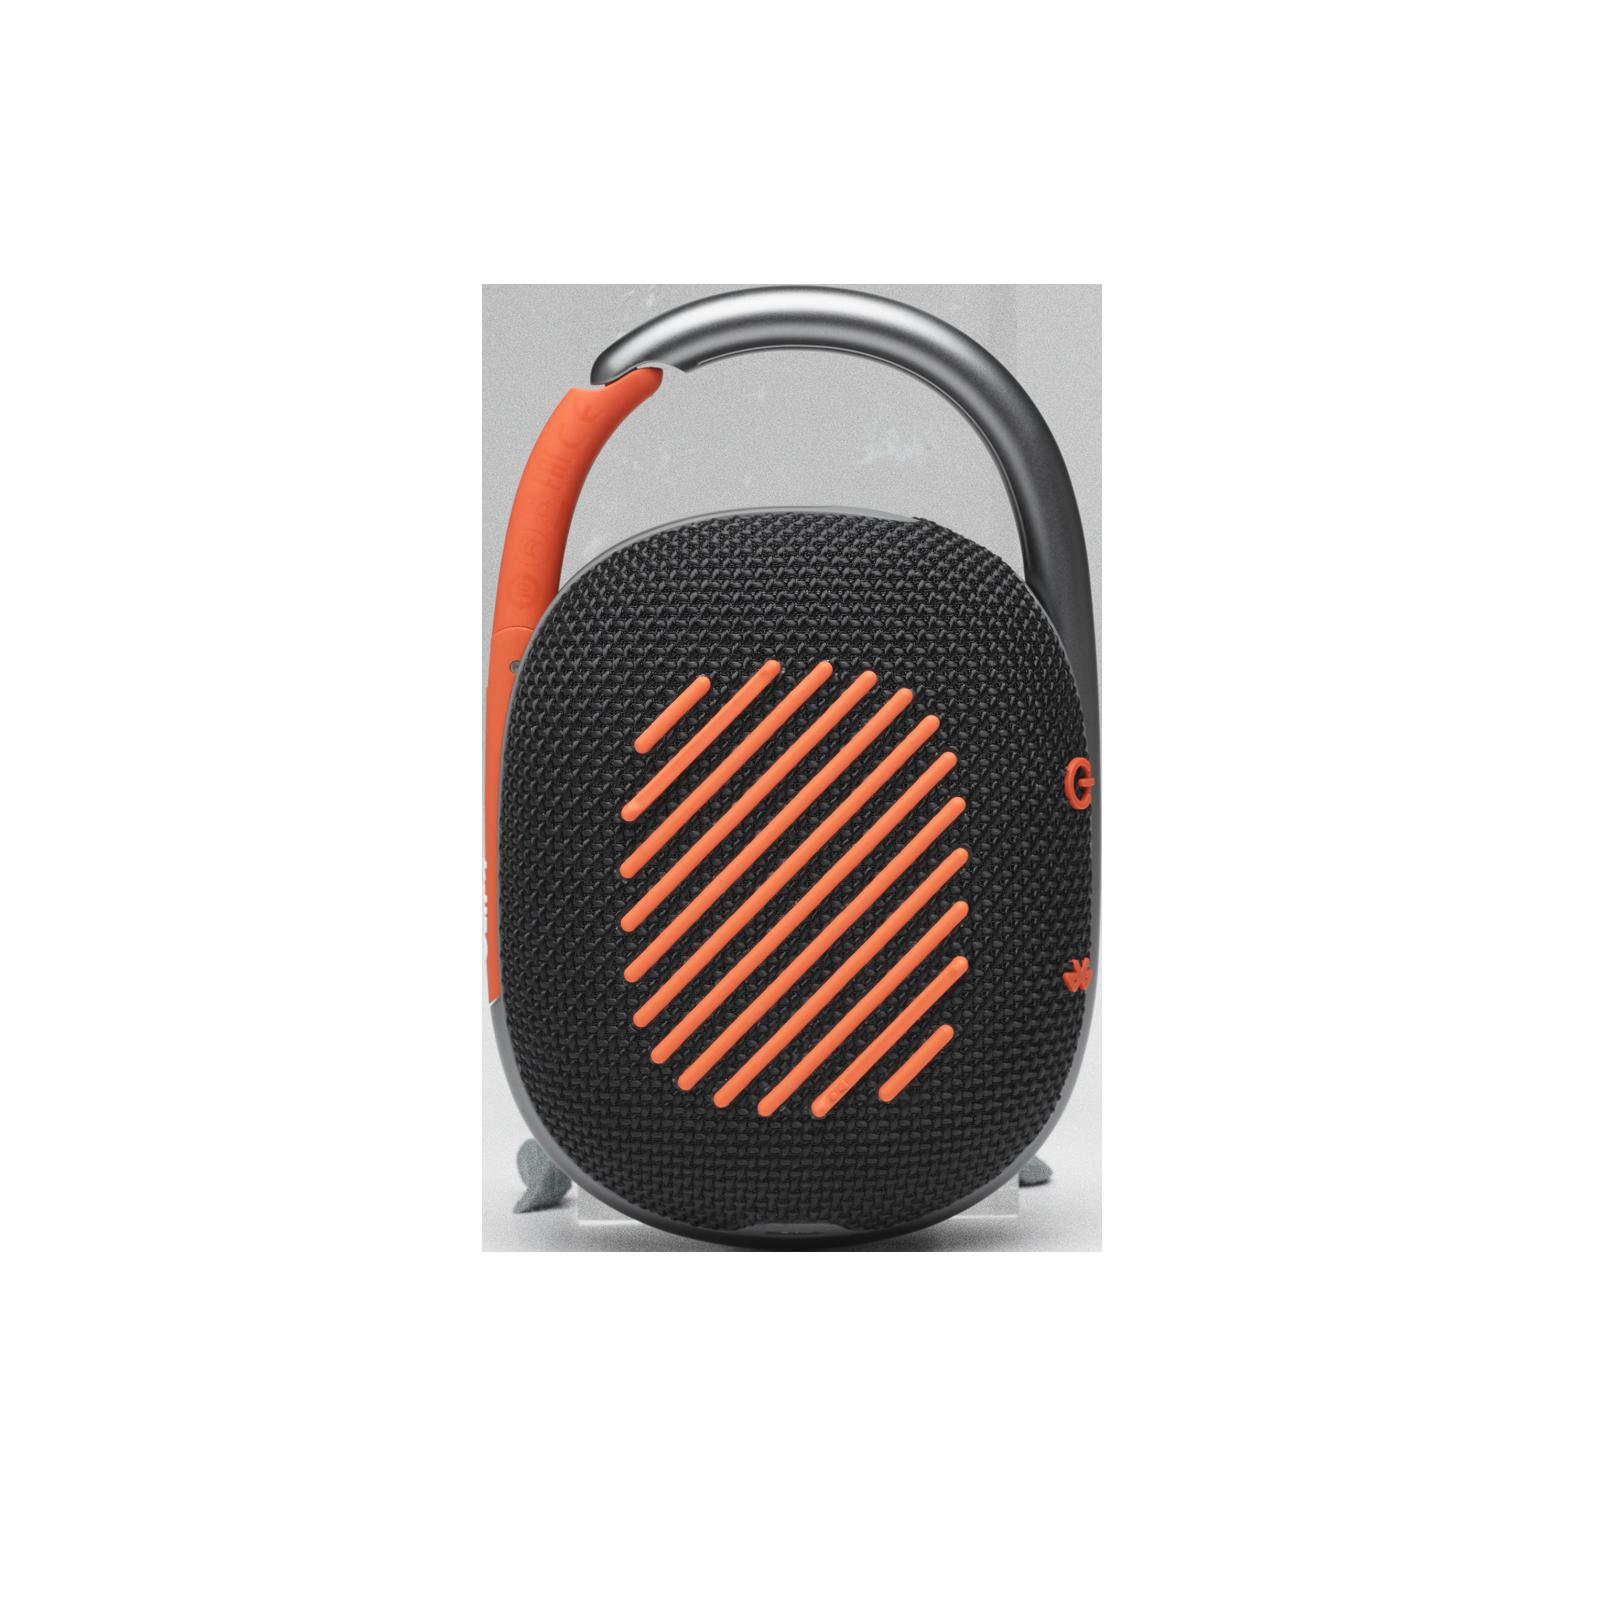 JBL CLIP 4 - Black / Orange - Ultra-portable Waterproof Speaker - Back